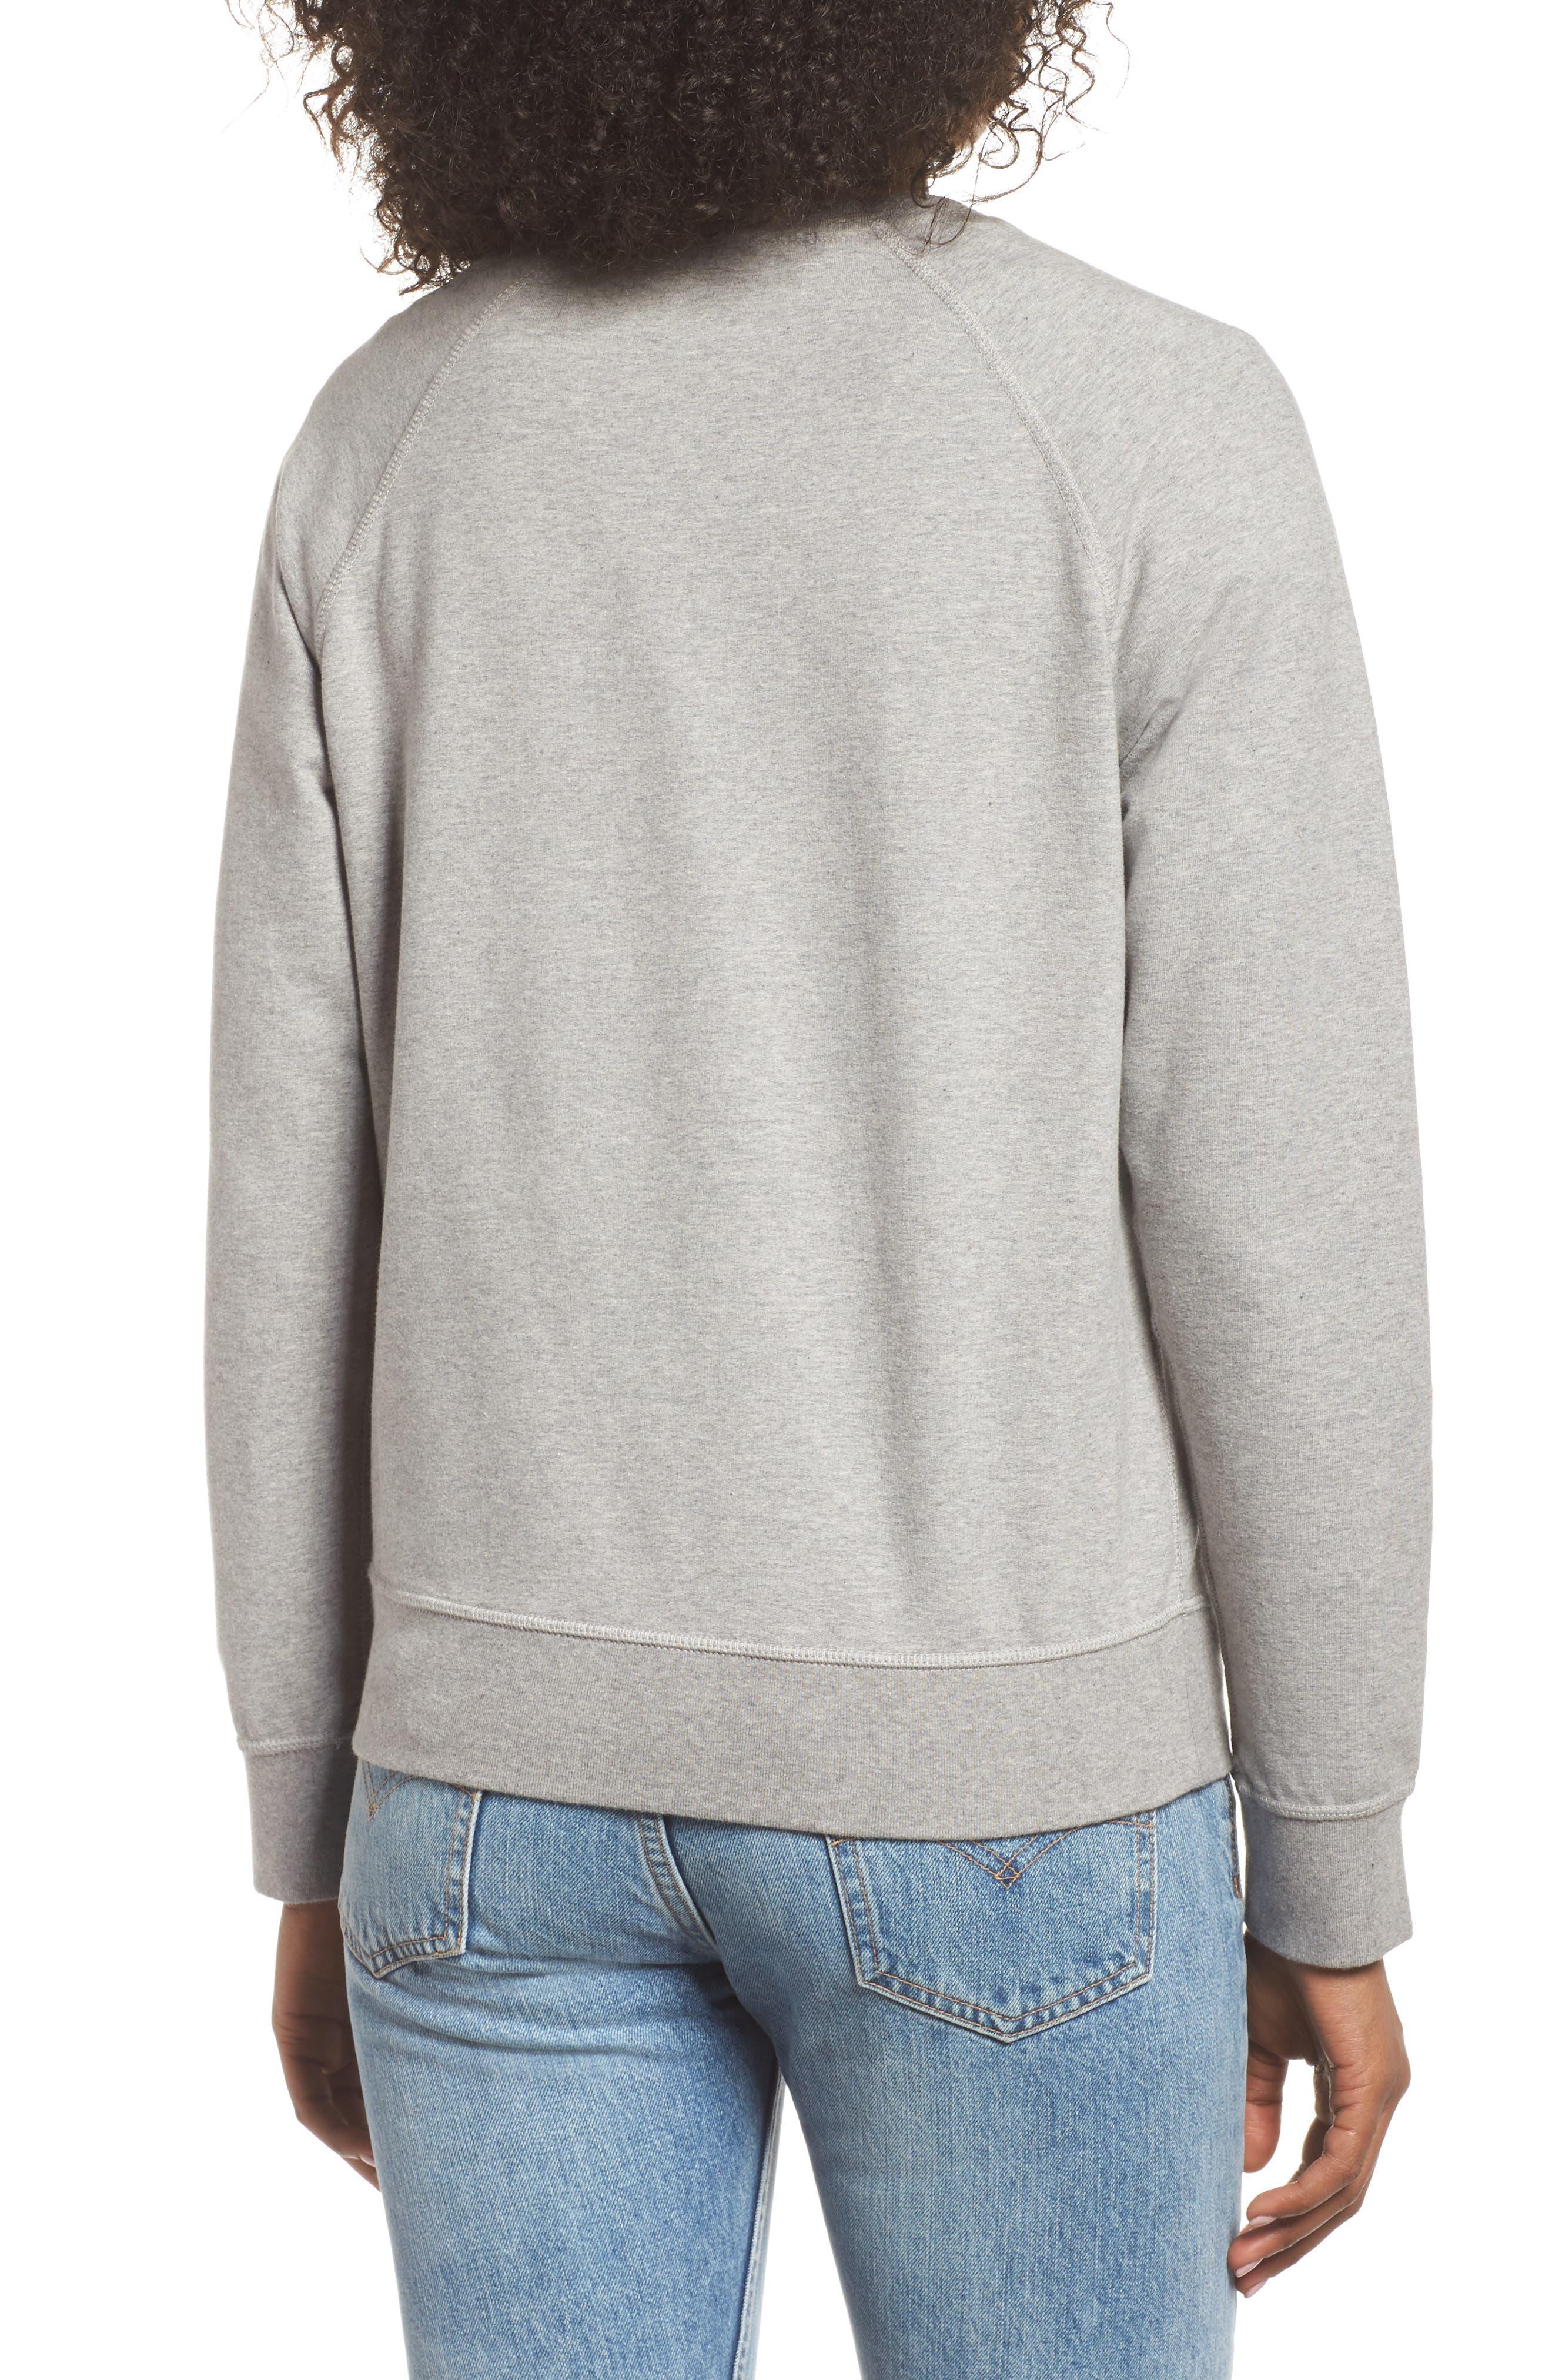 Pastel P-6 Label Midweight Sweatshirt,                             Alternate thumbnail 2, color,                             020